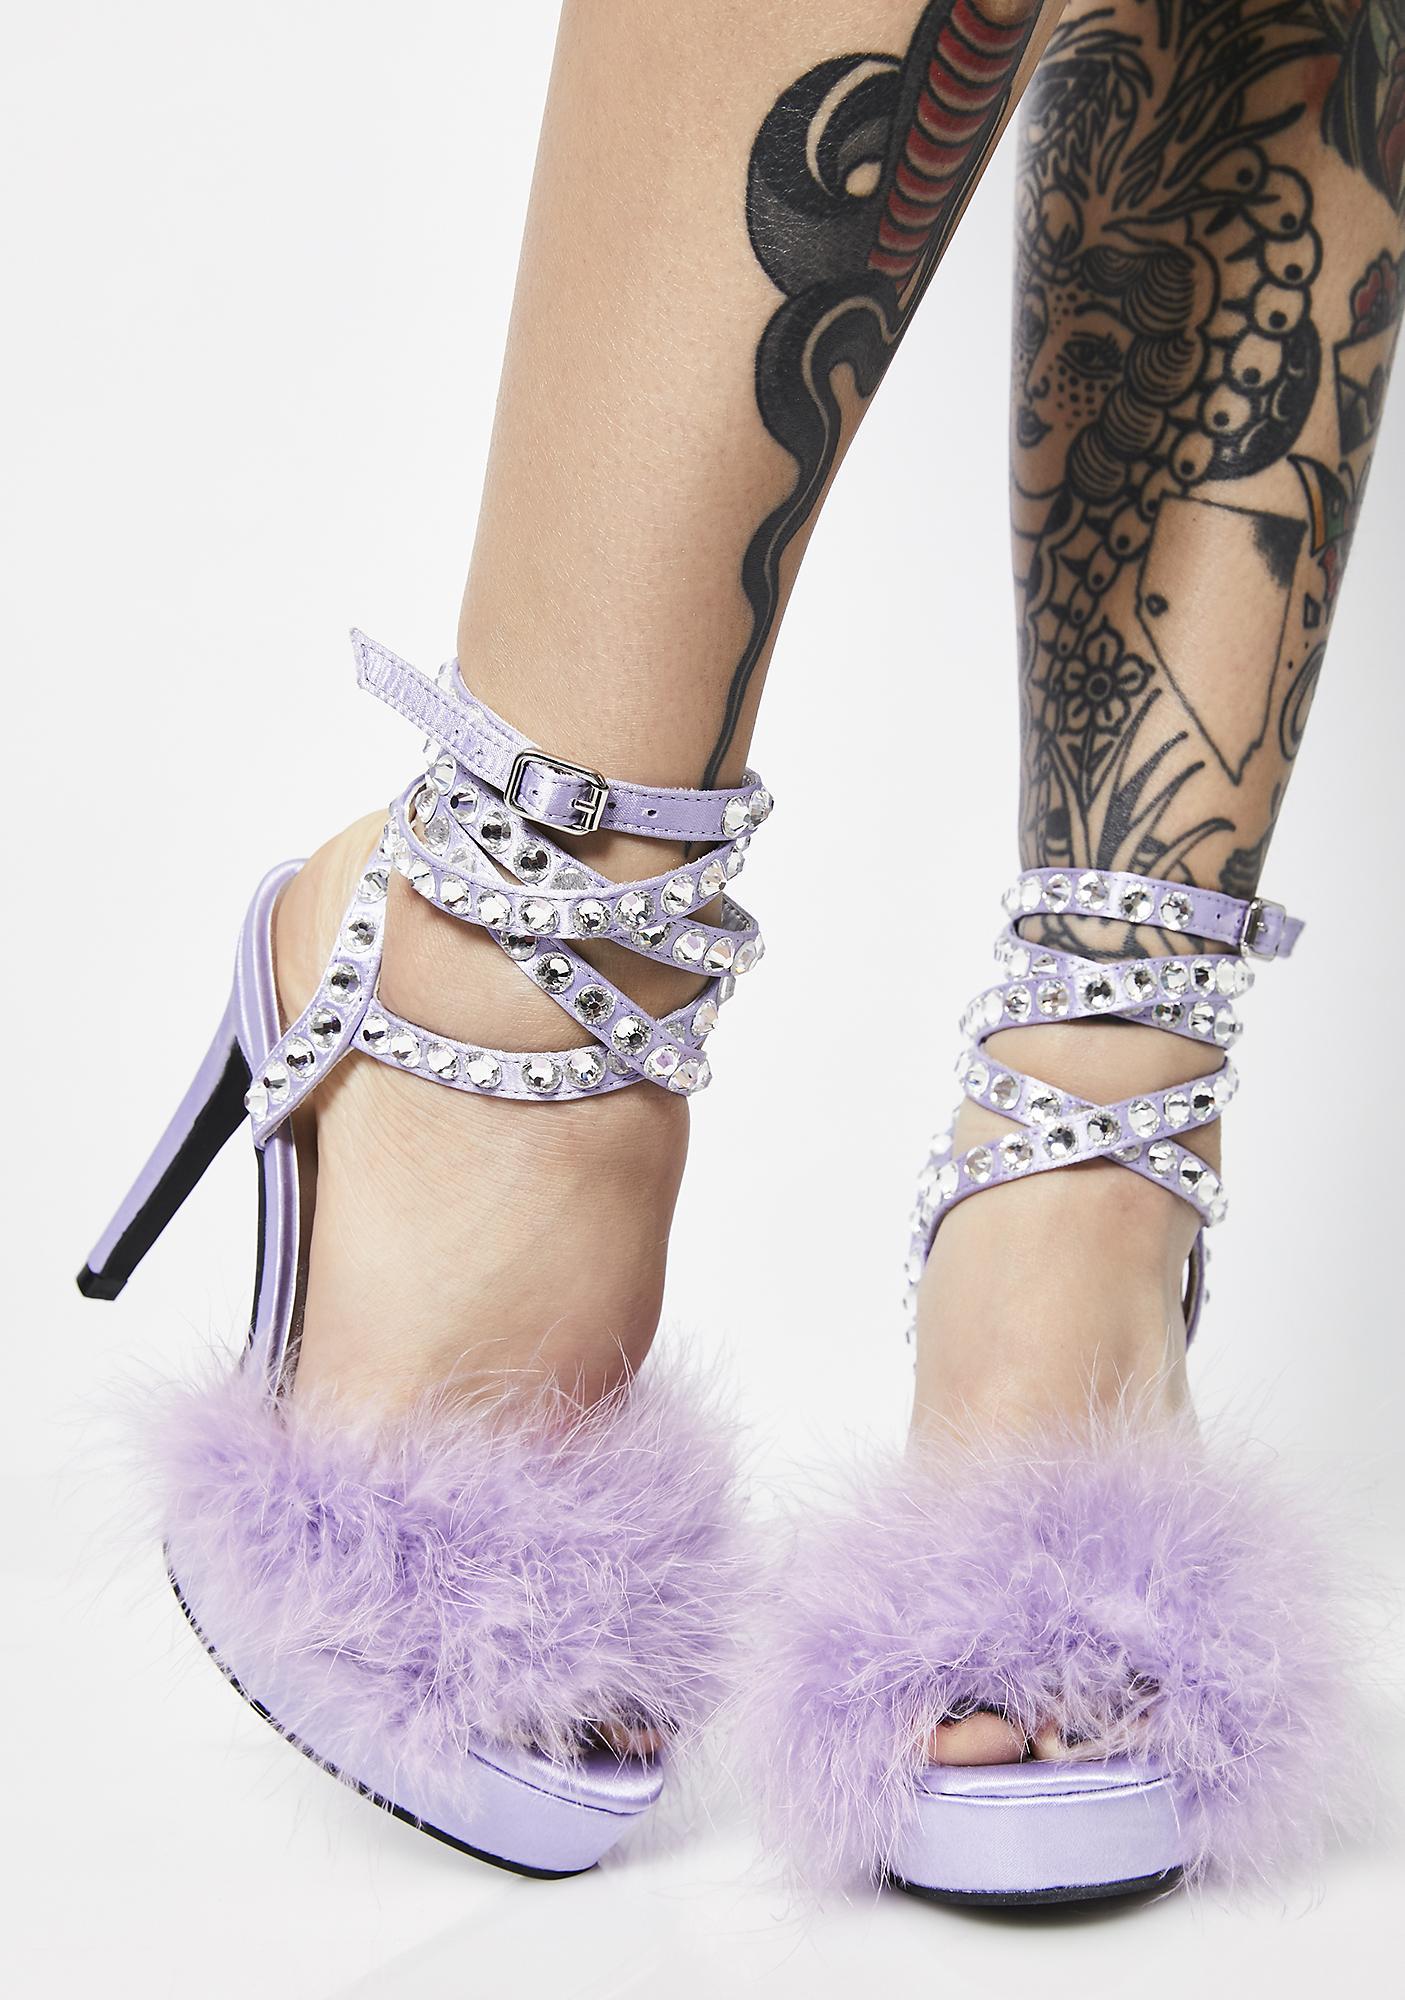 Sugar Thrillz Life Of Luxury Marabou Heels